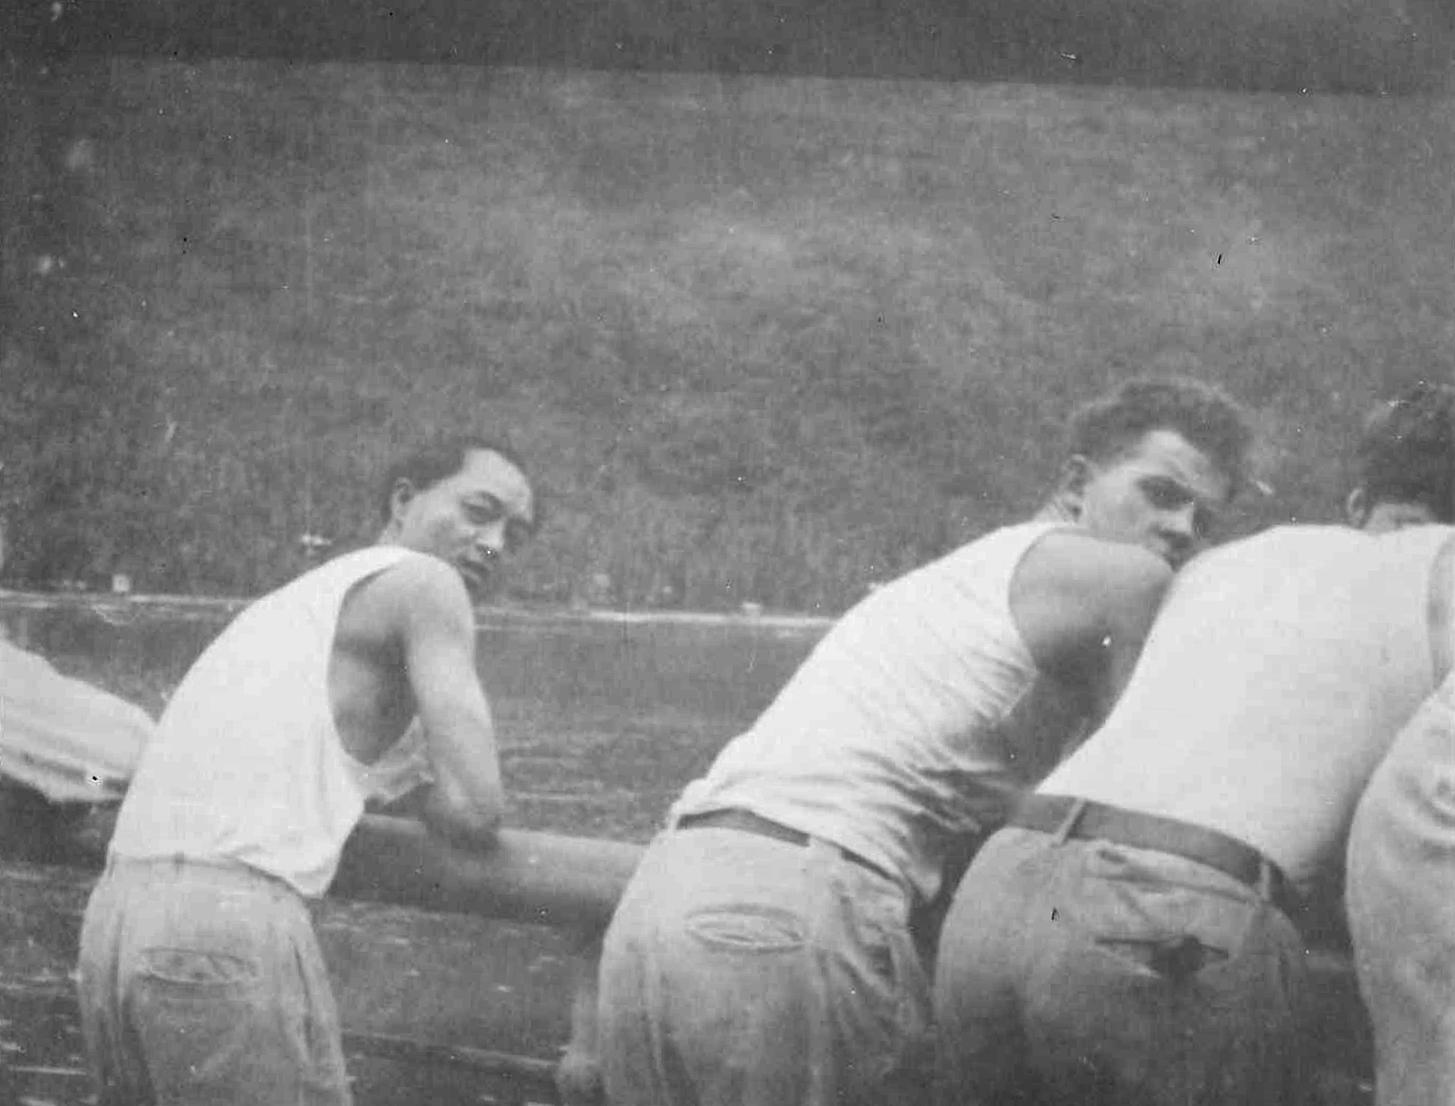 Deck Hands in Pago Pago